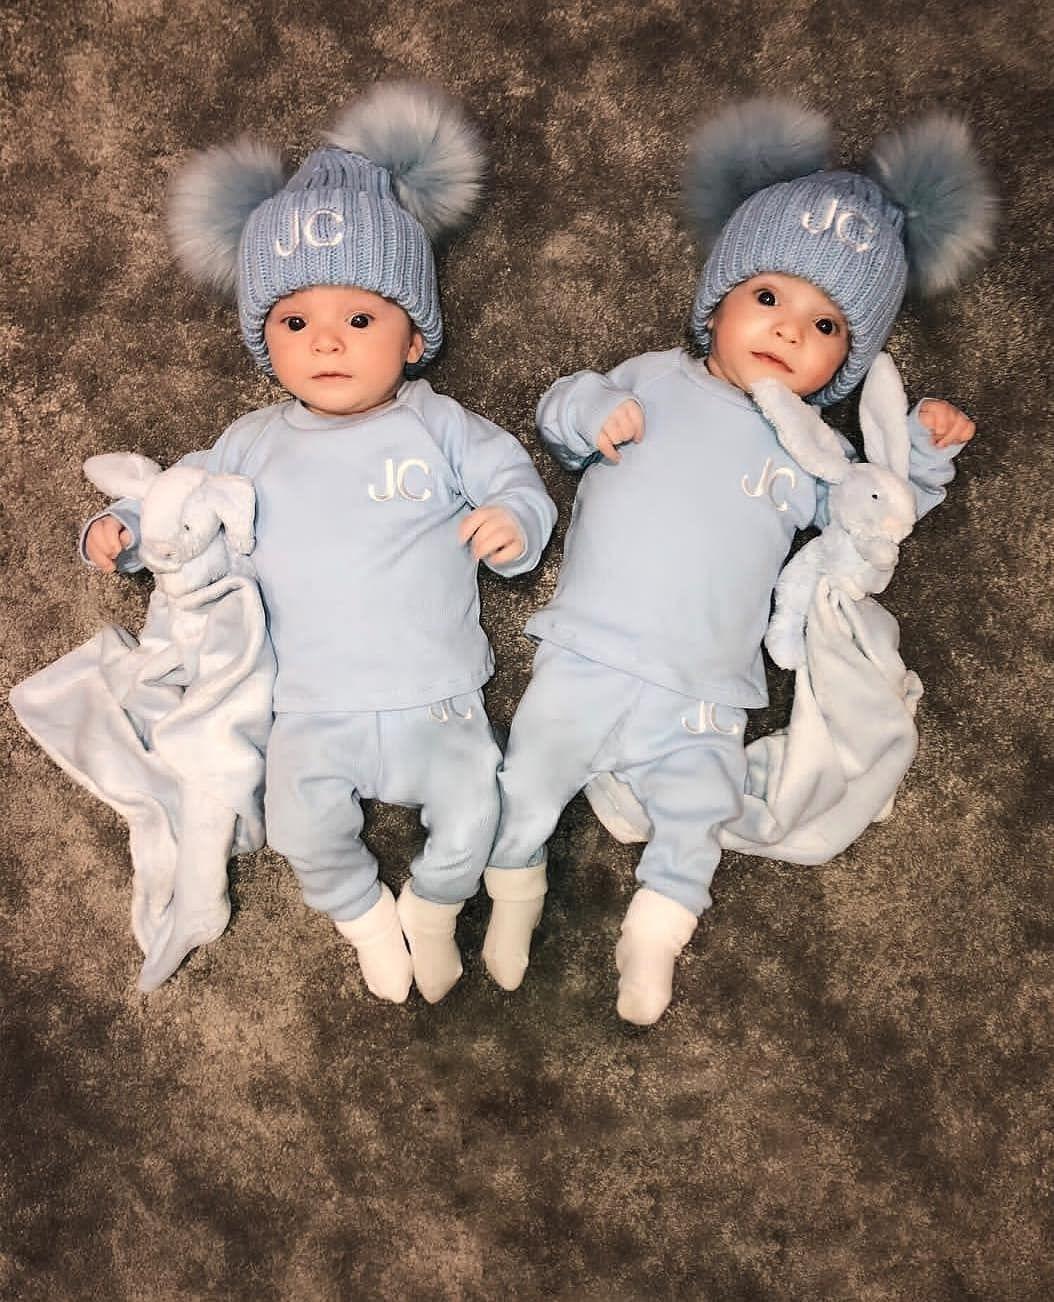 Babycute Twin Twins Baby اطفال توينز توأم مساء مساء الخير صور صوره توام تصميم تصاميم مواليد رمزيه كيوت كياته اكسبلور صبا Baby Onesies Instagram Posts Clothes